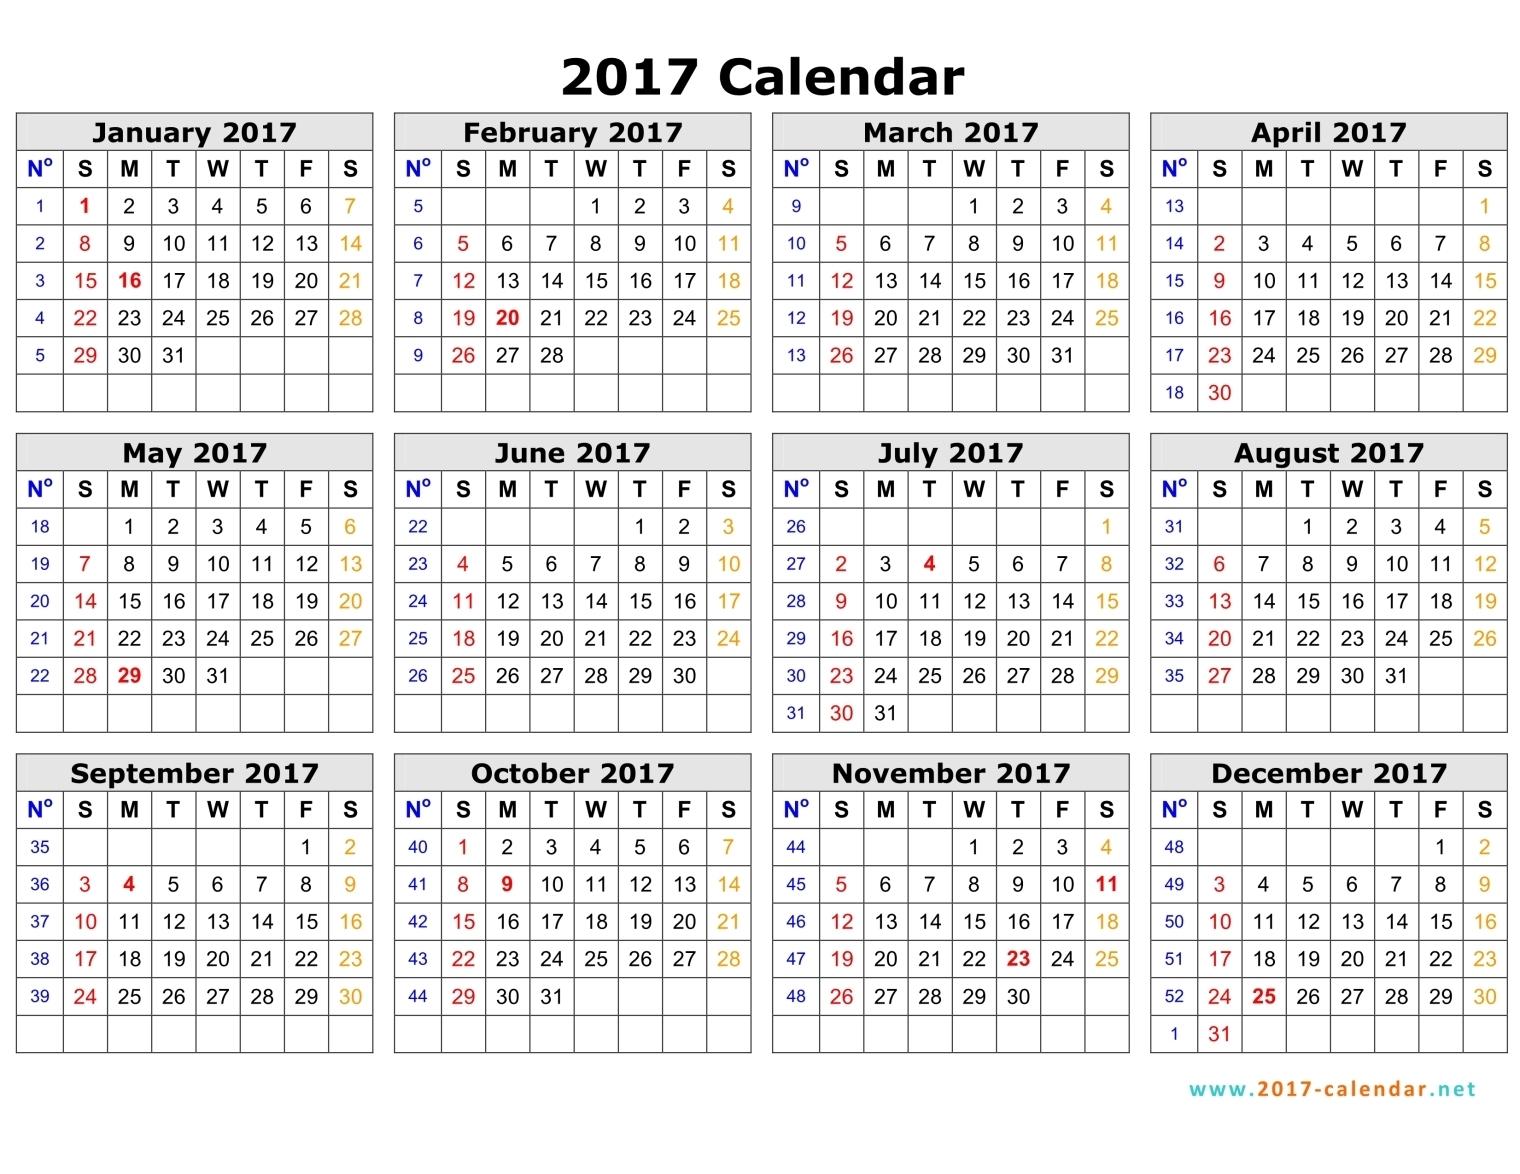 Islamic Calendar 2017 Uk | printable calendar templates